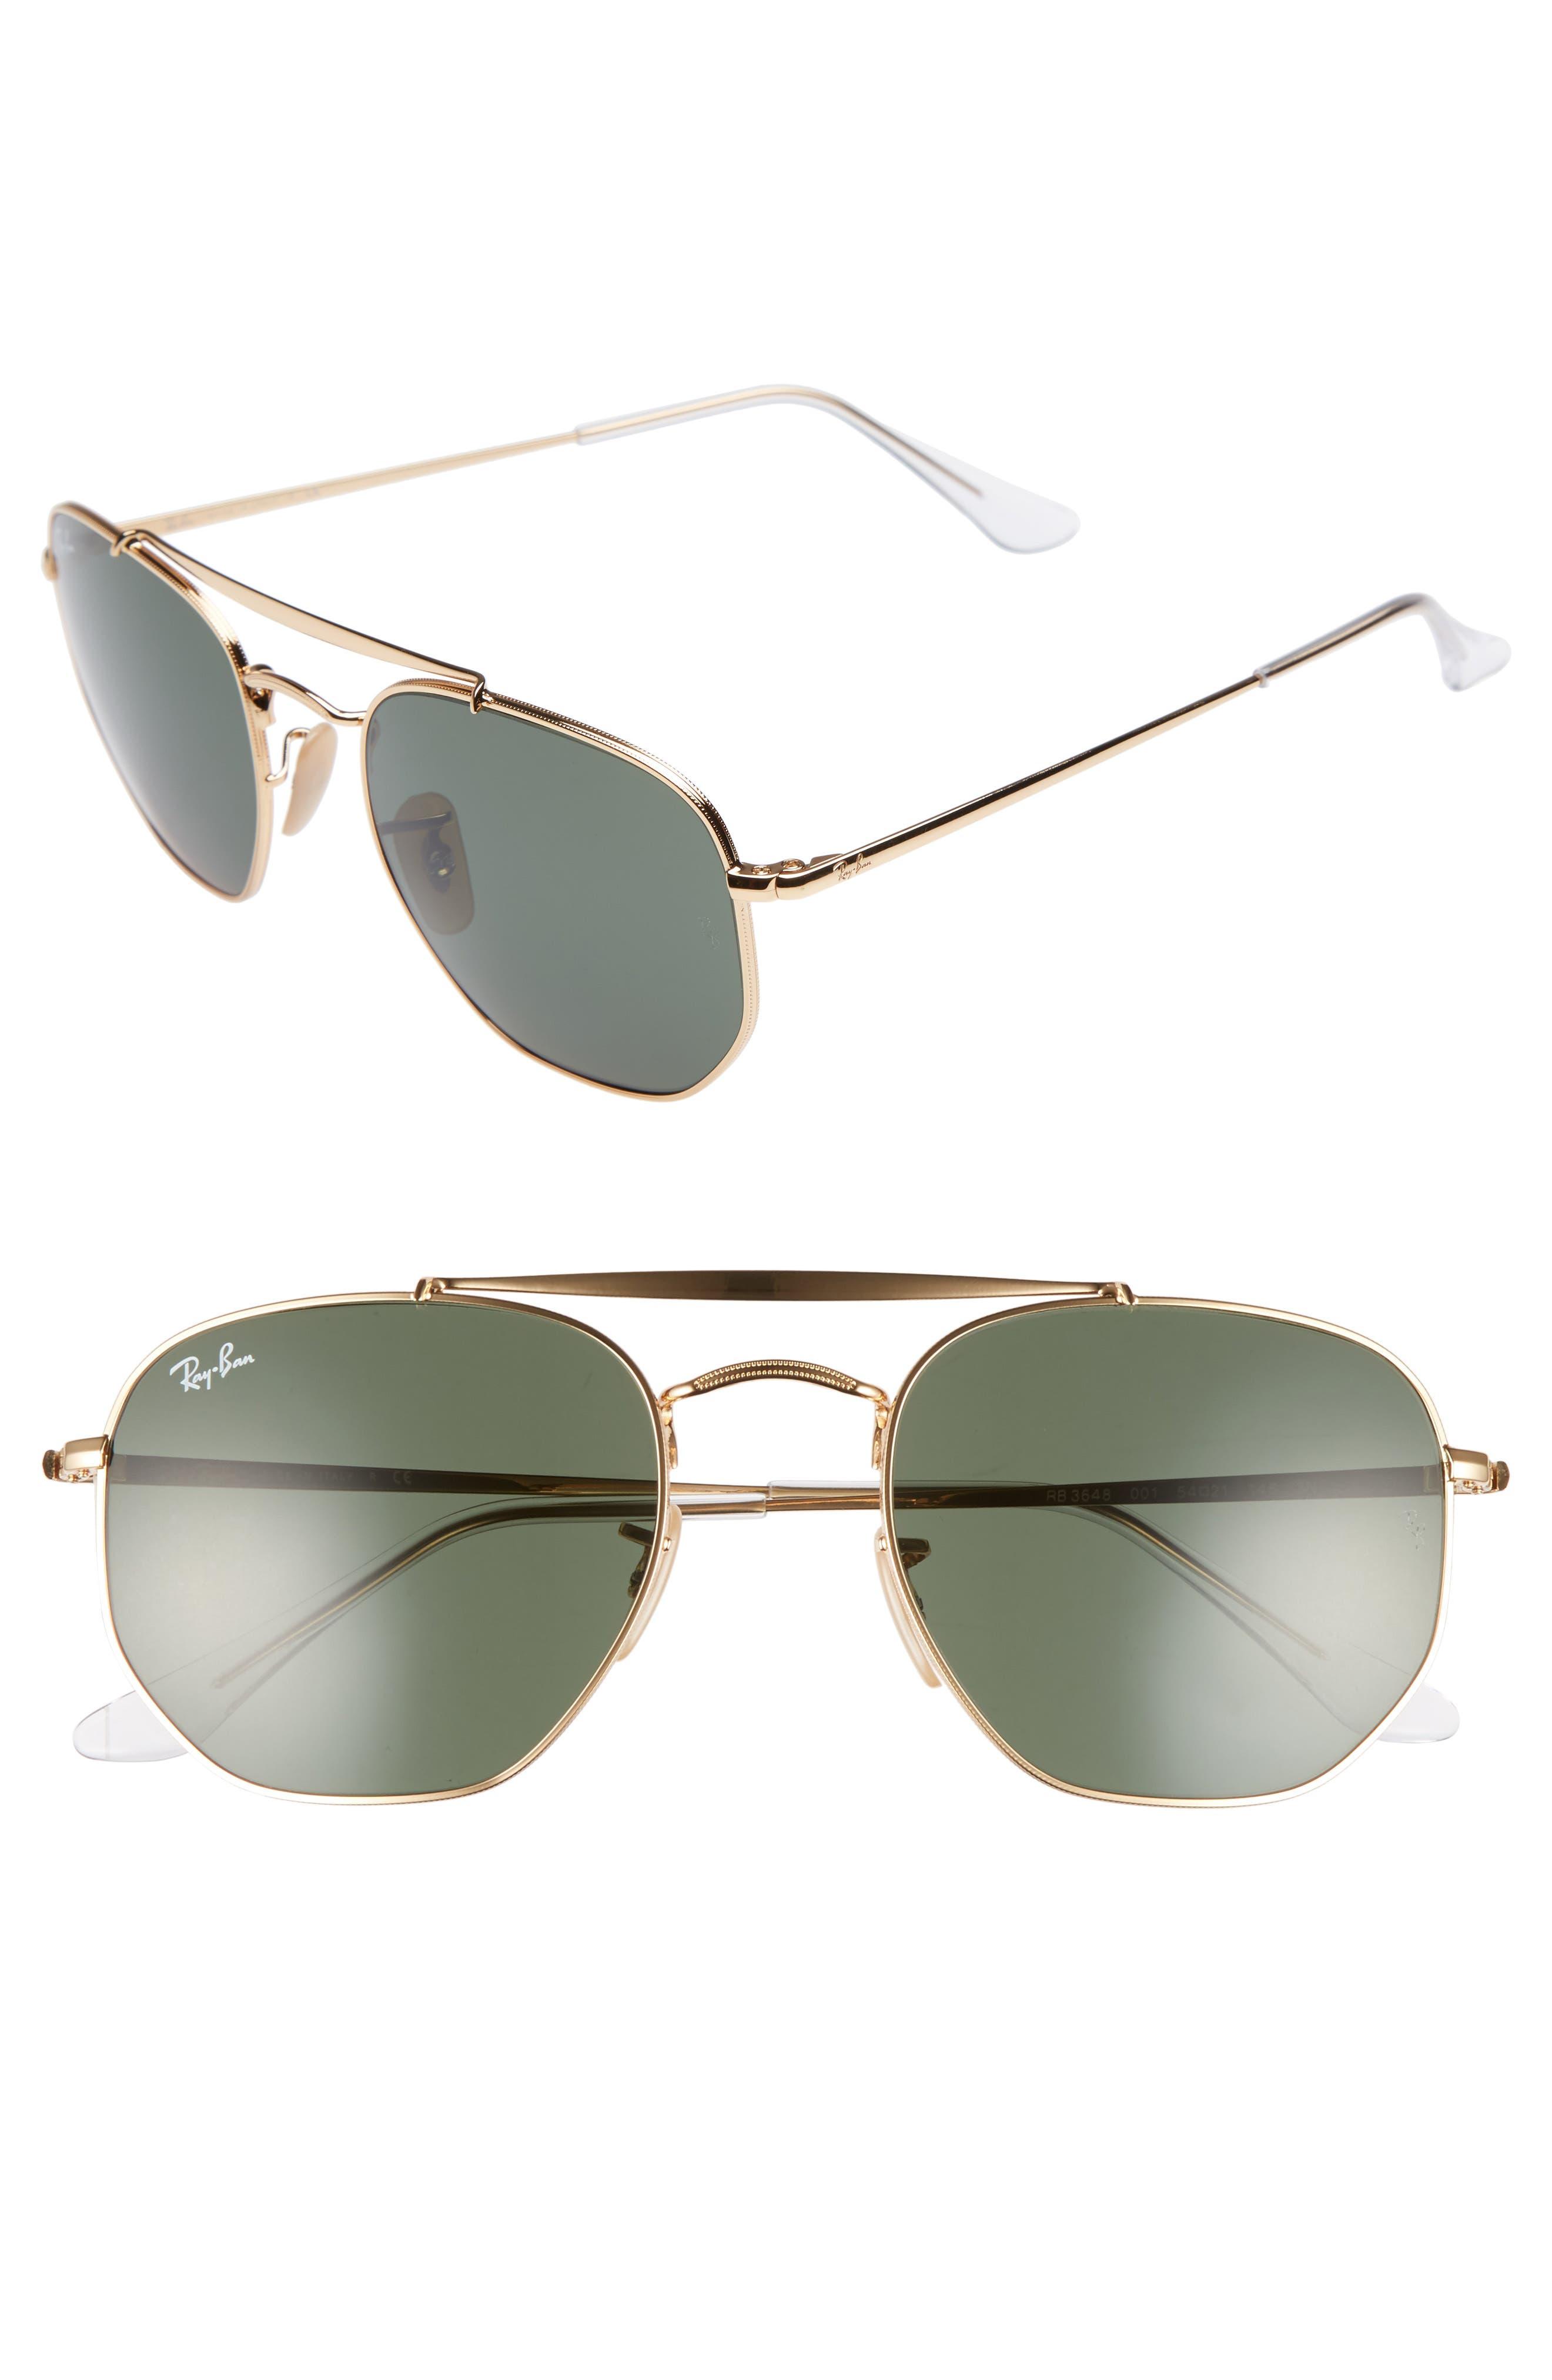 3592 54mm Sunglasses,                         Main,                         color, 710